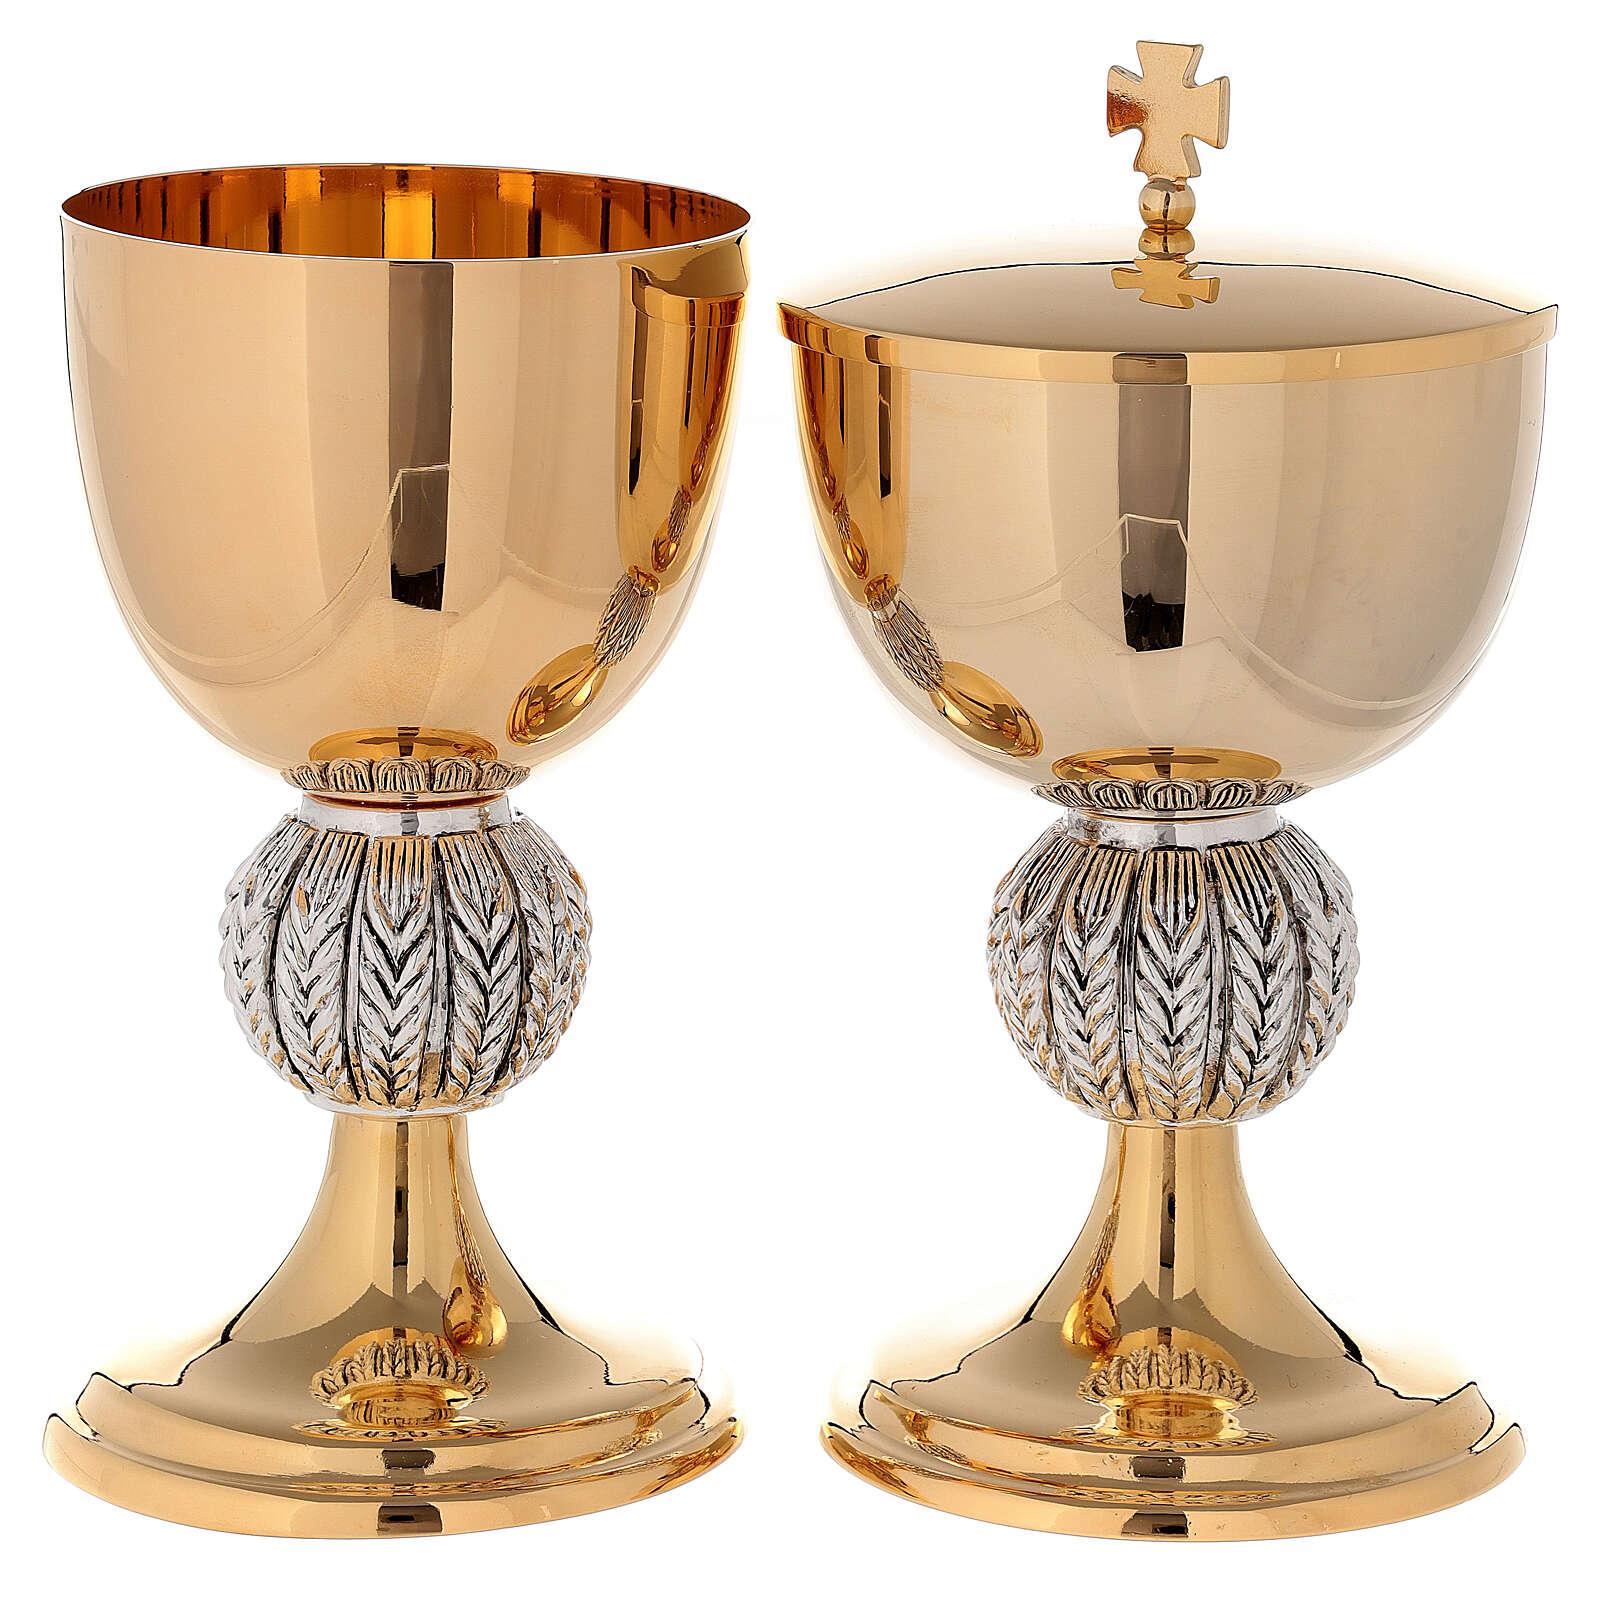 Chalice and ciborium 24-karat gold plated brass spikes node 4